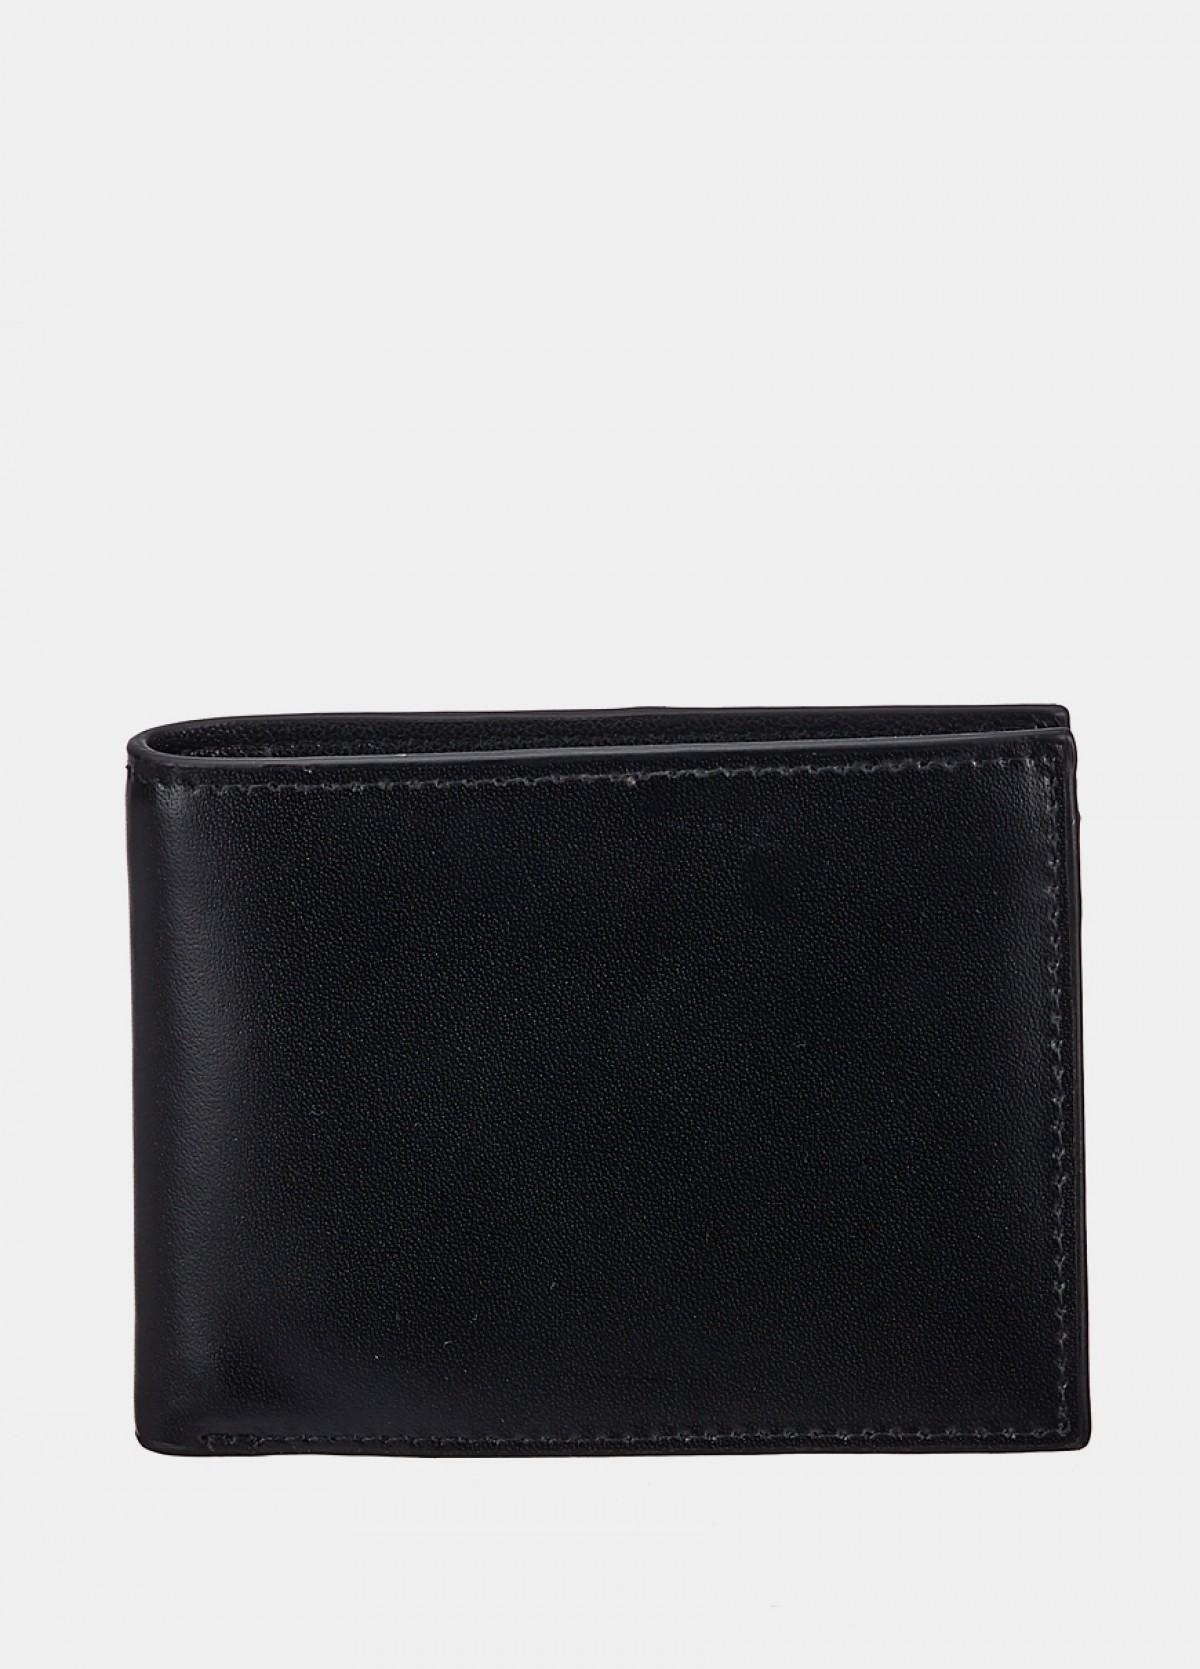 The Bi-Fold Men Wallet